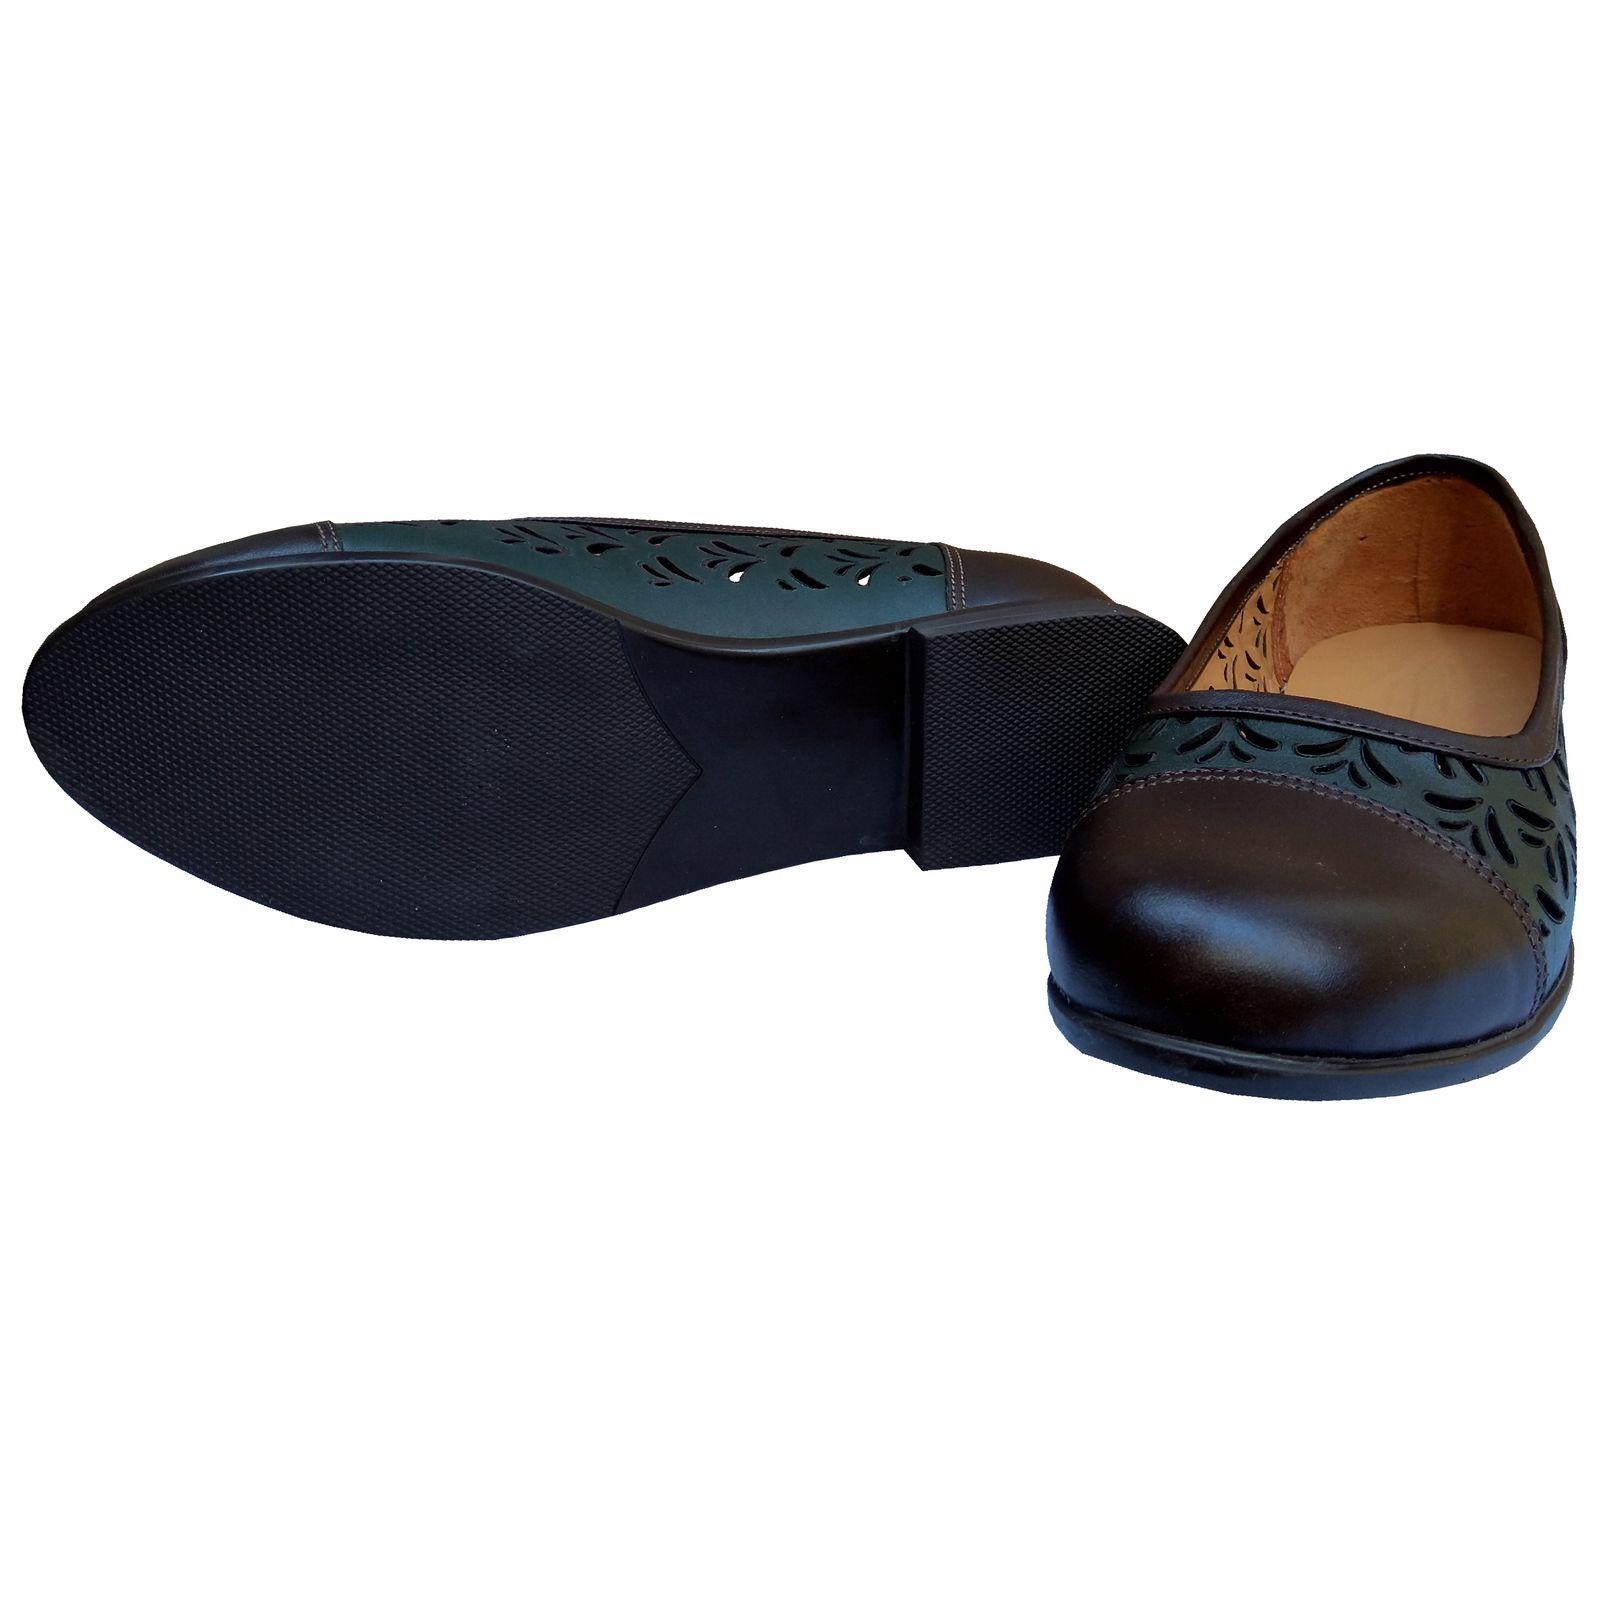 کفش زنانه مدل SK 310 -  - 5